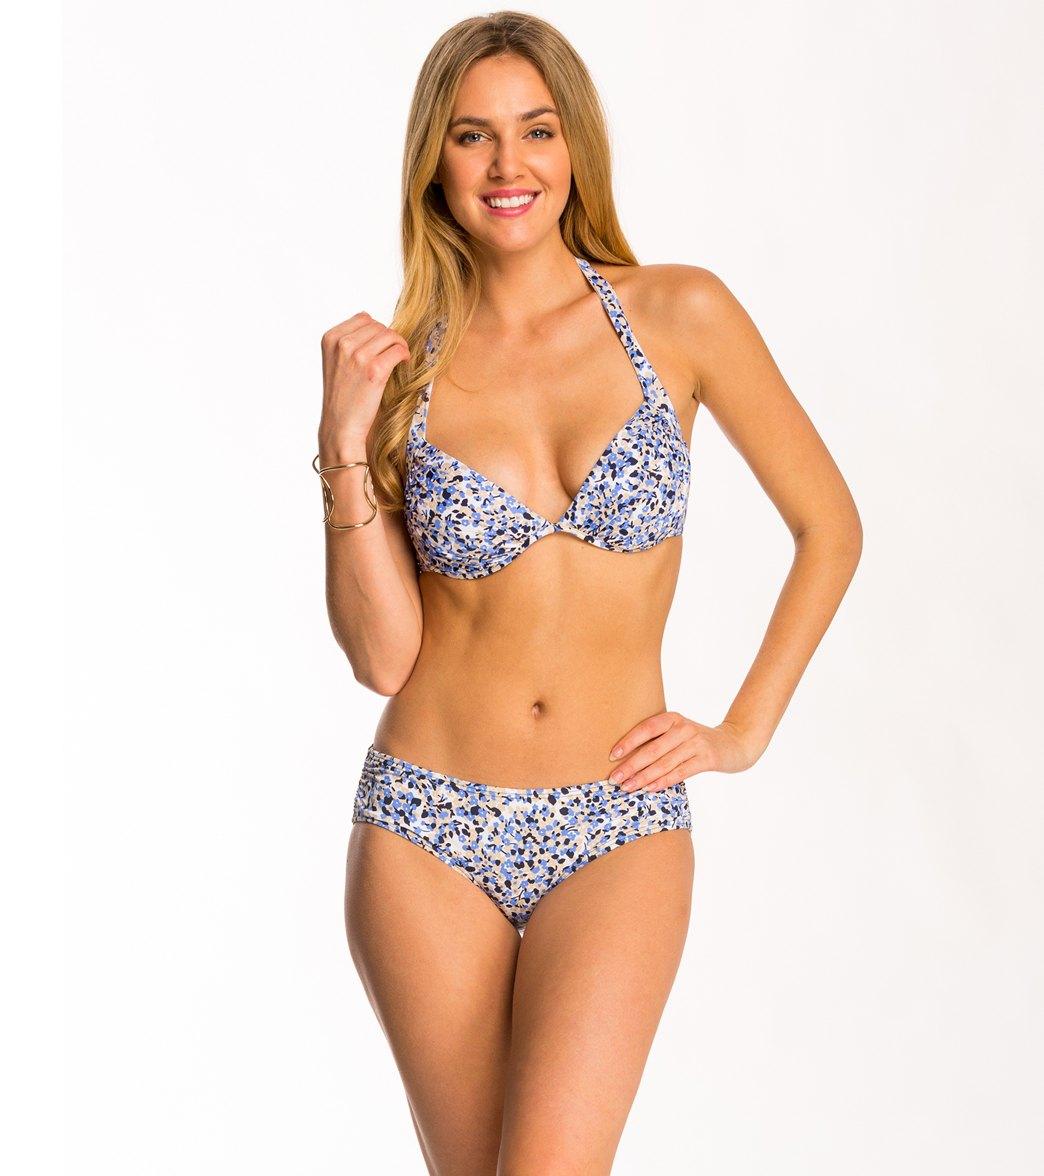 0eff76b5960 Michael Kors Swimwear Chiltington Underwire Halter Bikini Top at ...